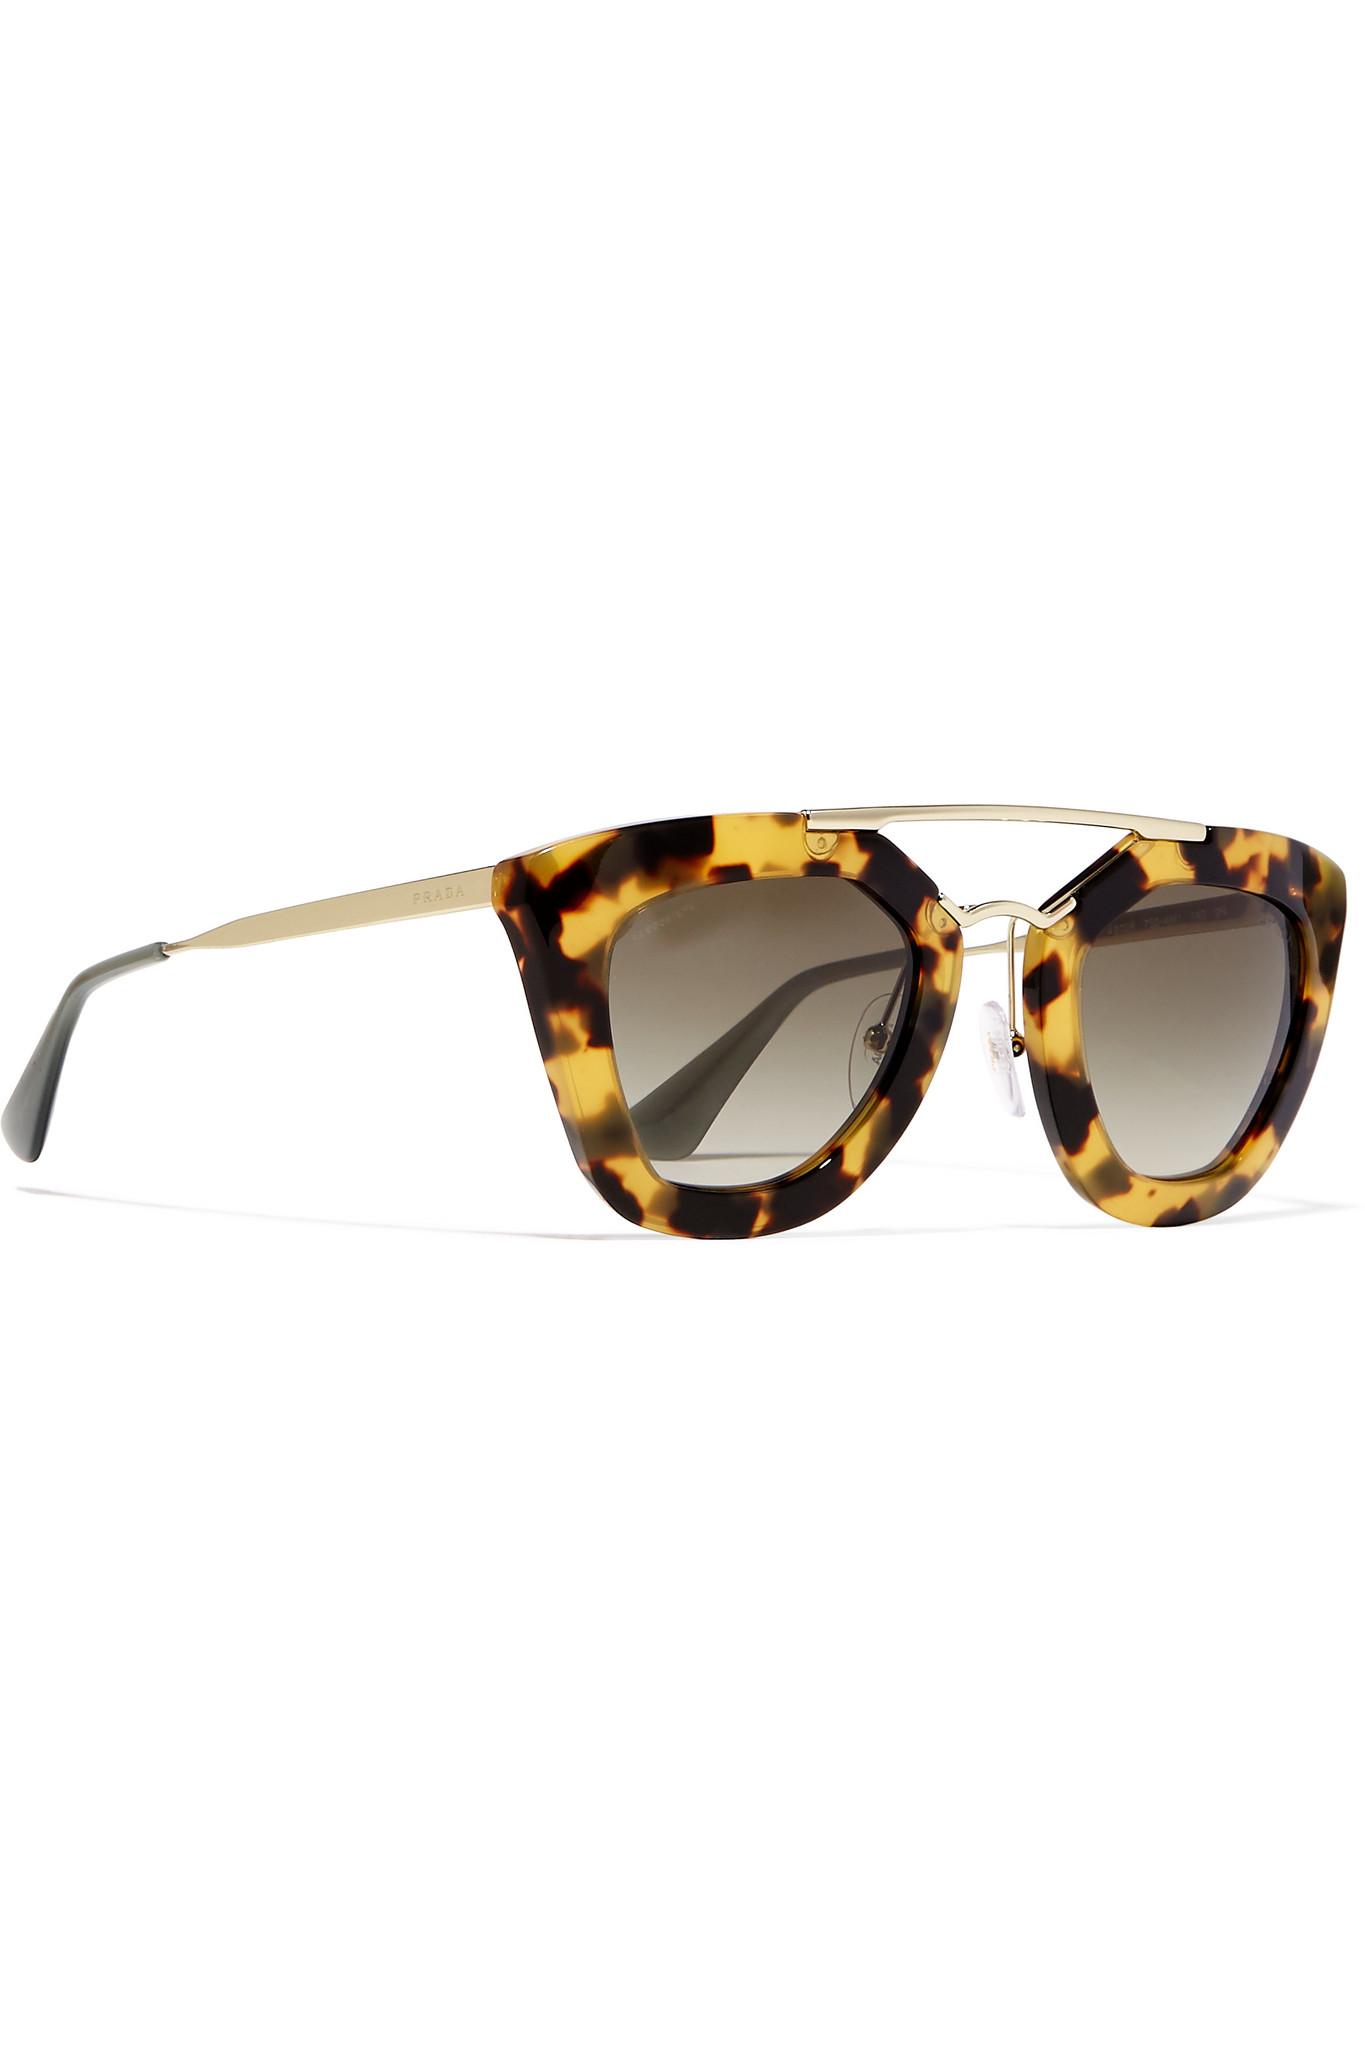 e3289bee0e Lyst - Prada D-frame Acetate And Gold-tone Sunglasses in Brown